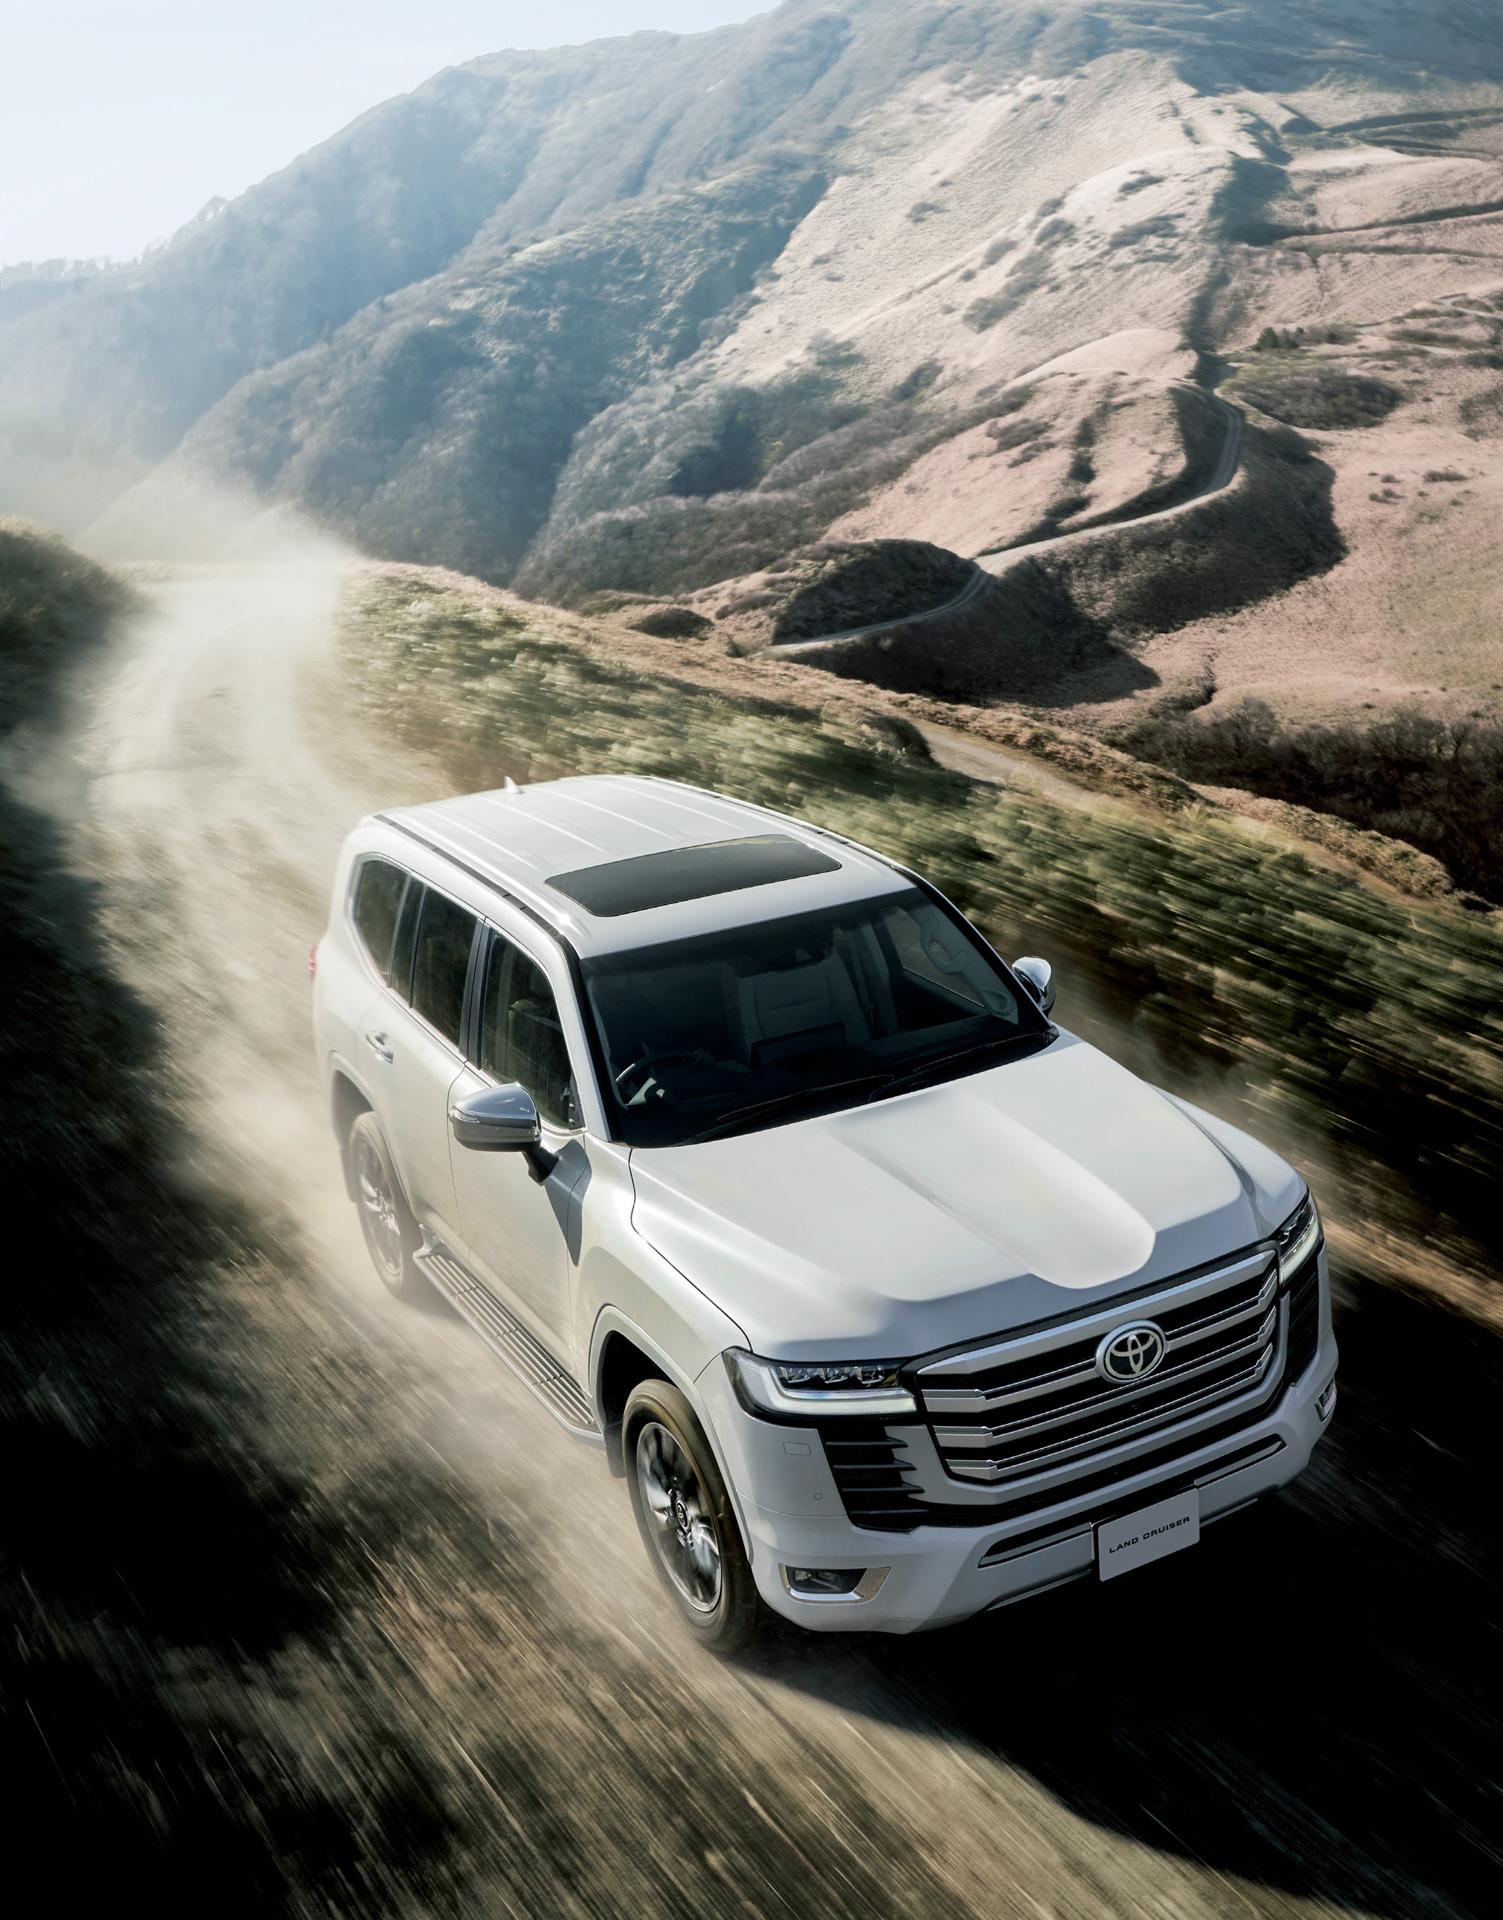 Toyota Launches New Land Cruiser - Image 3